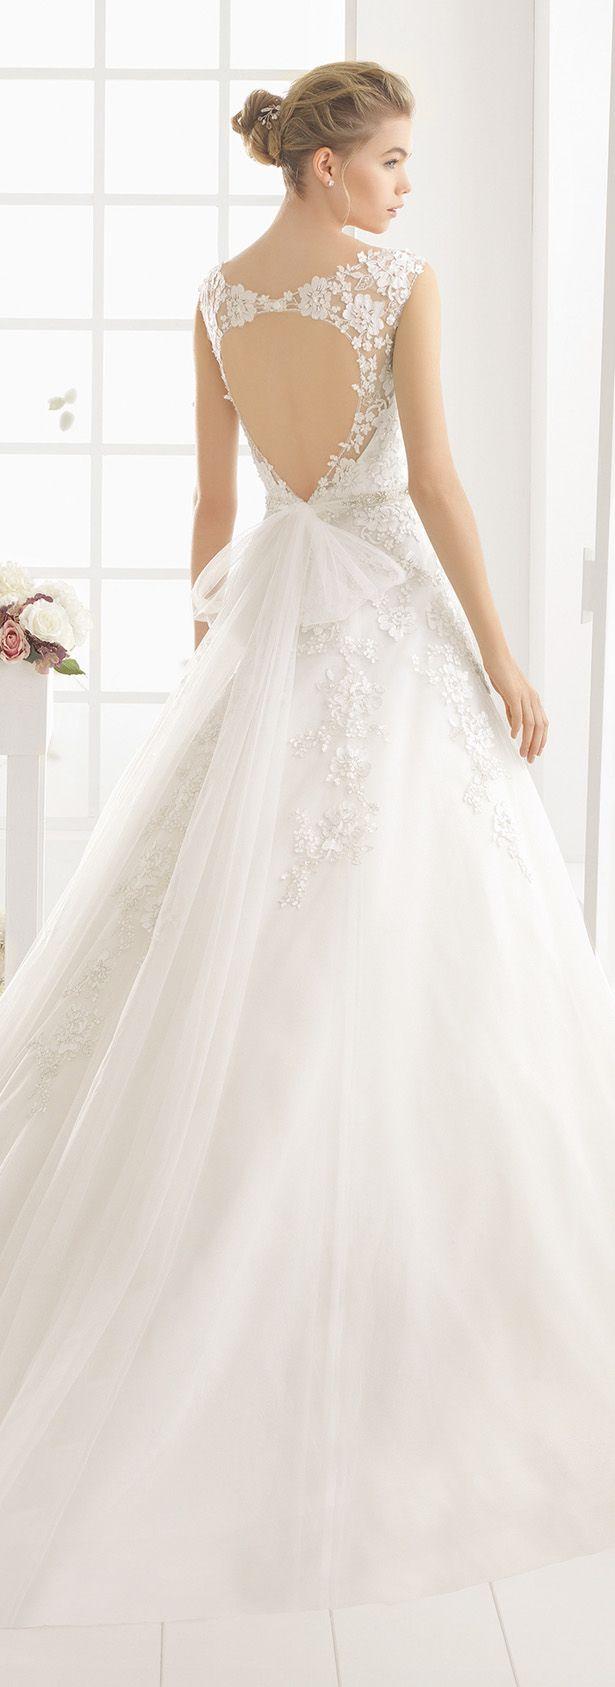 Wedding-Dresses-0535